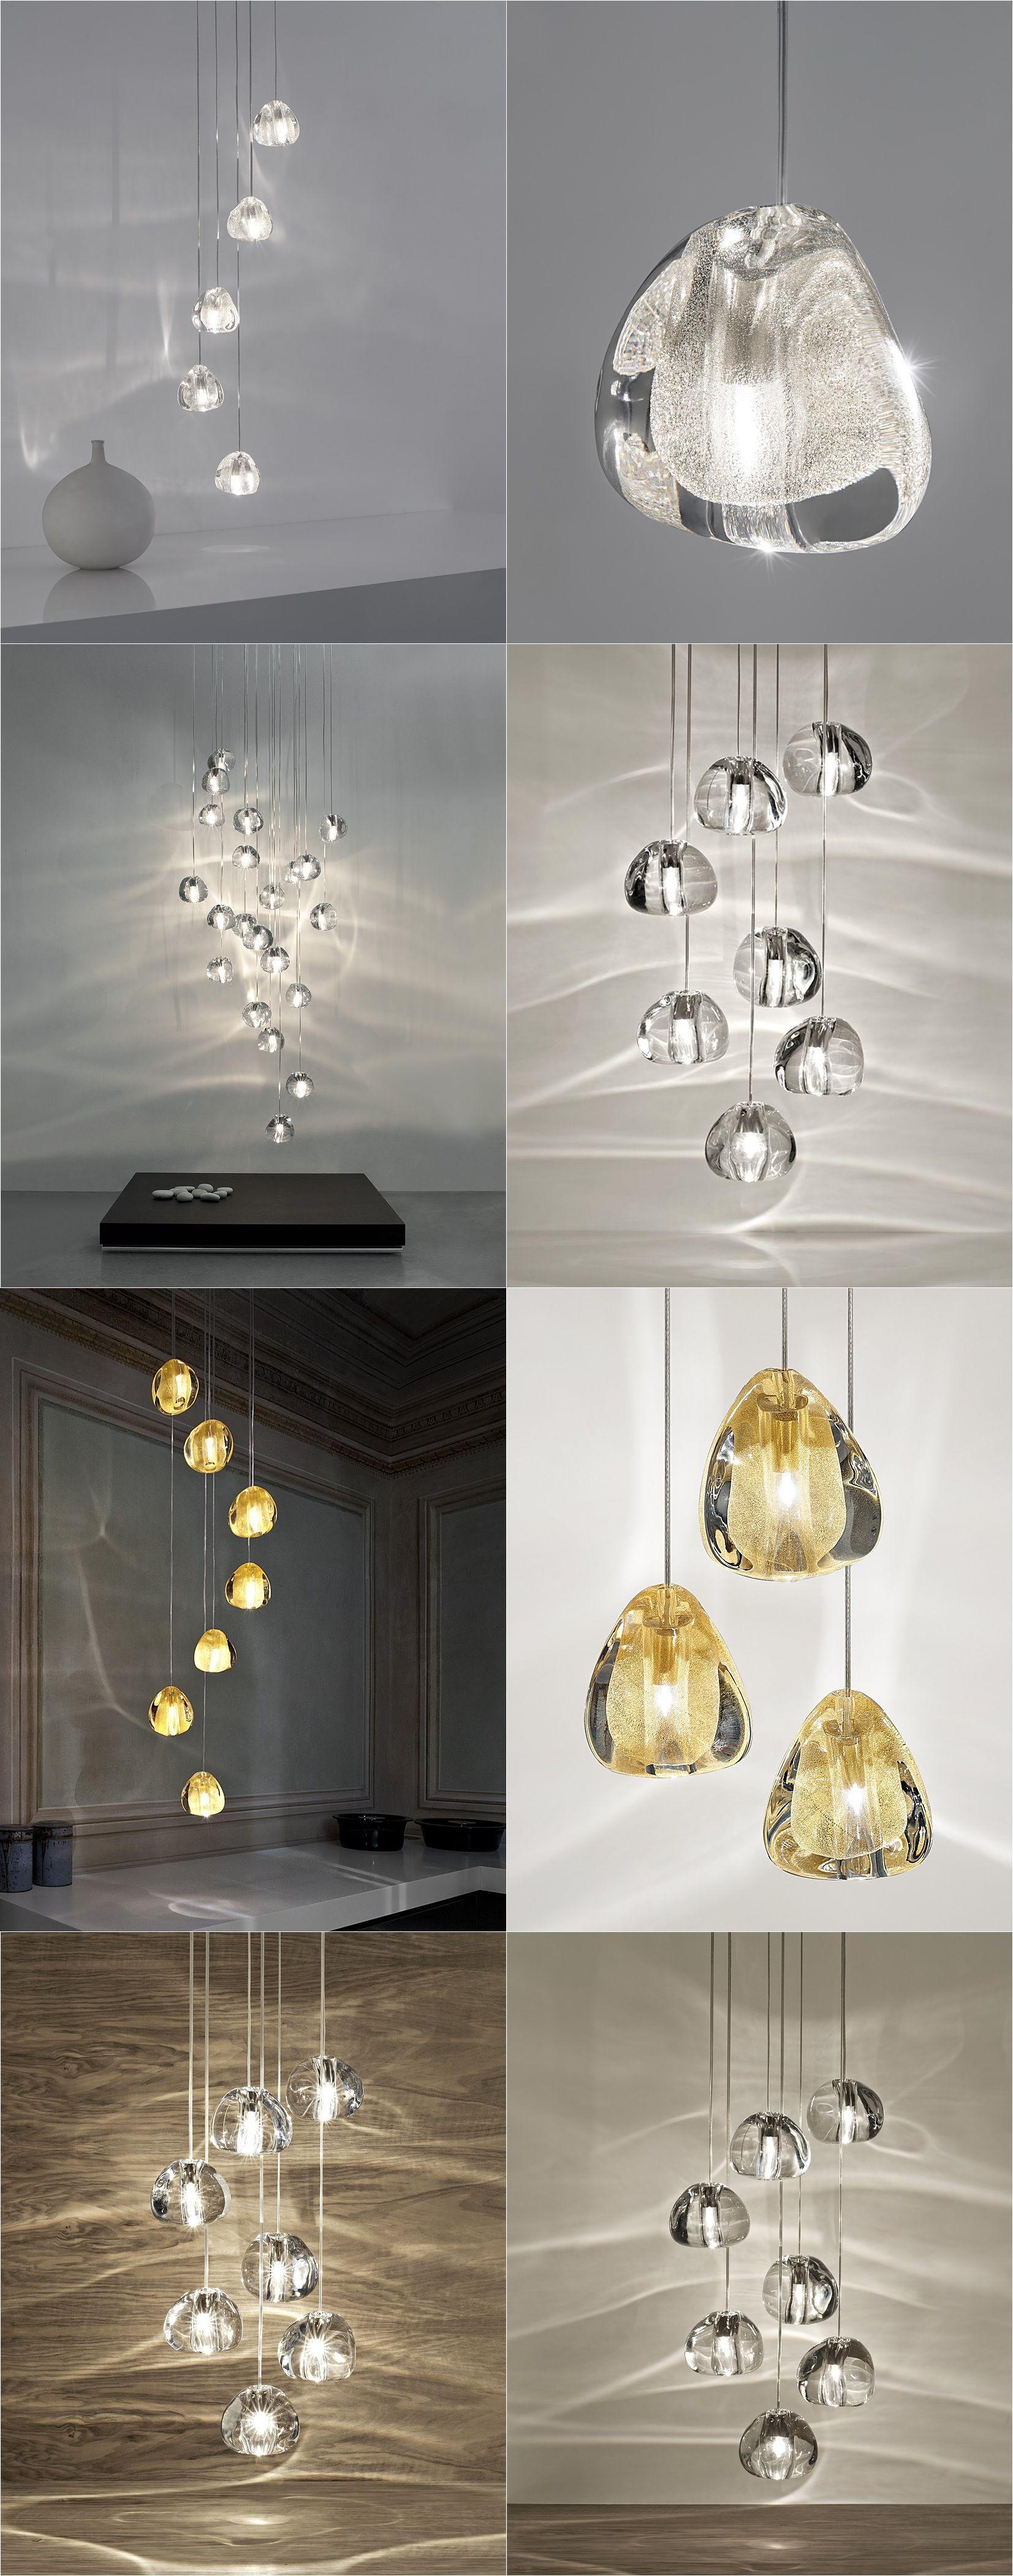 JUEJA Modern Crystal Chandeliers Light LED Ceiling Lamp